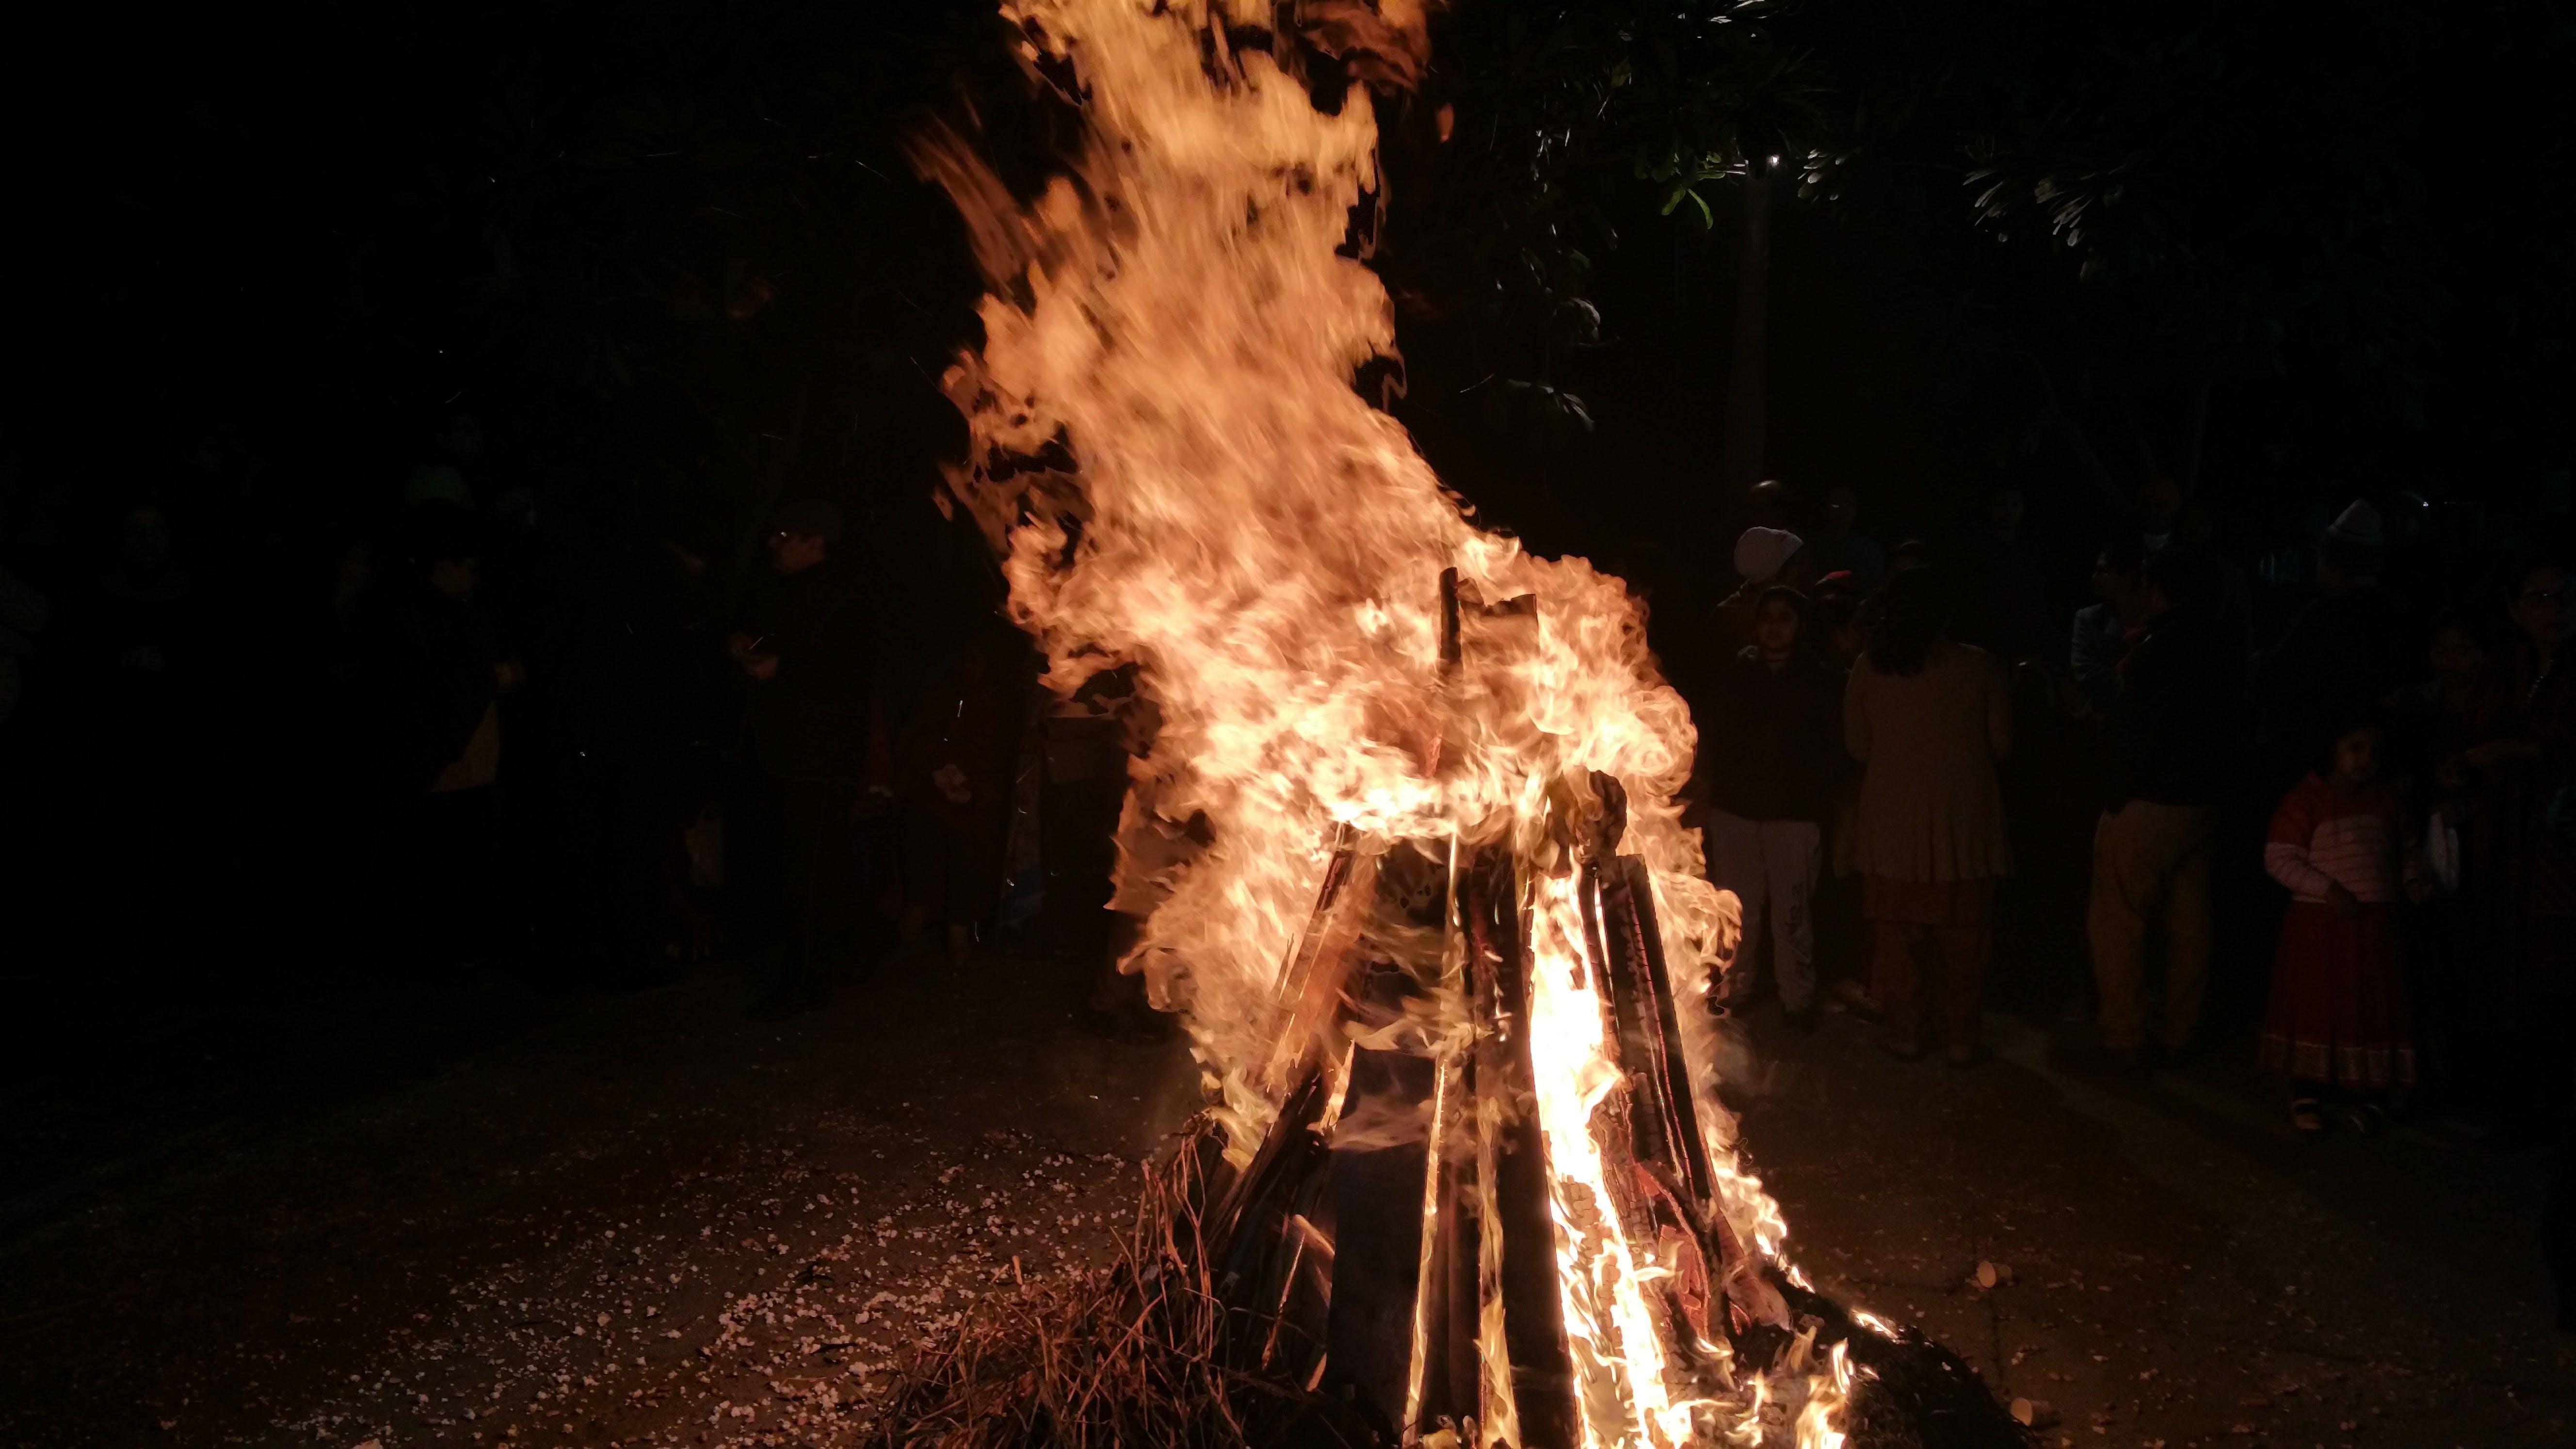 Free stock photo of bonfire, burn, dark, fire